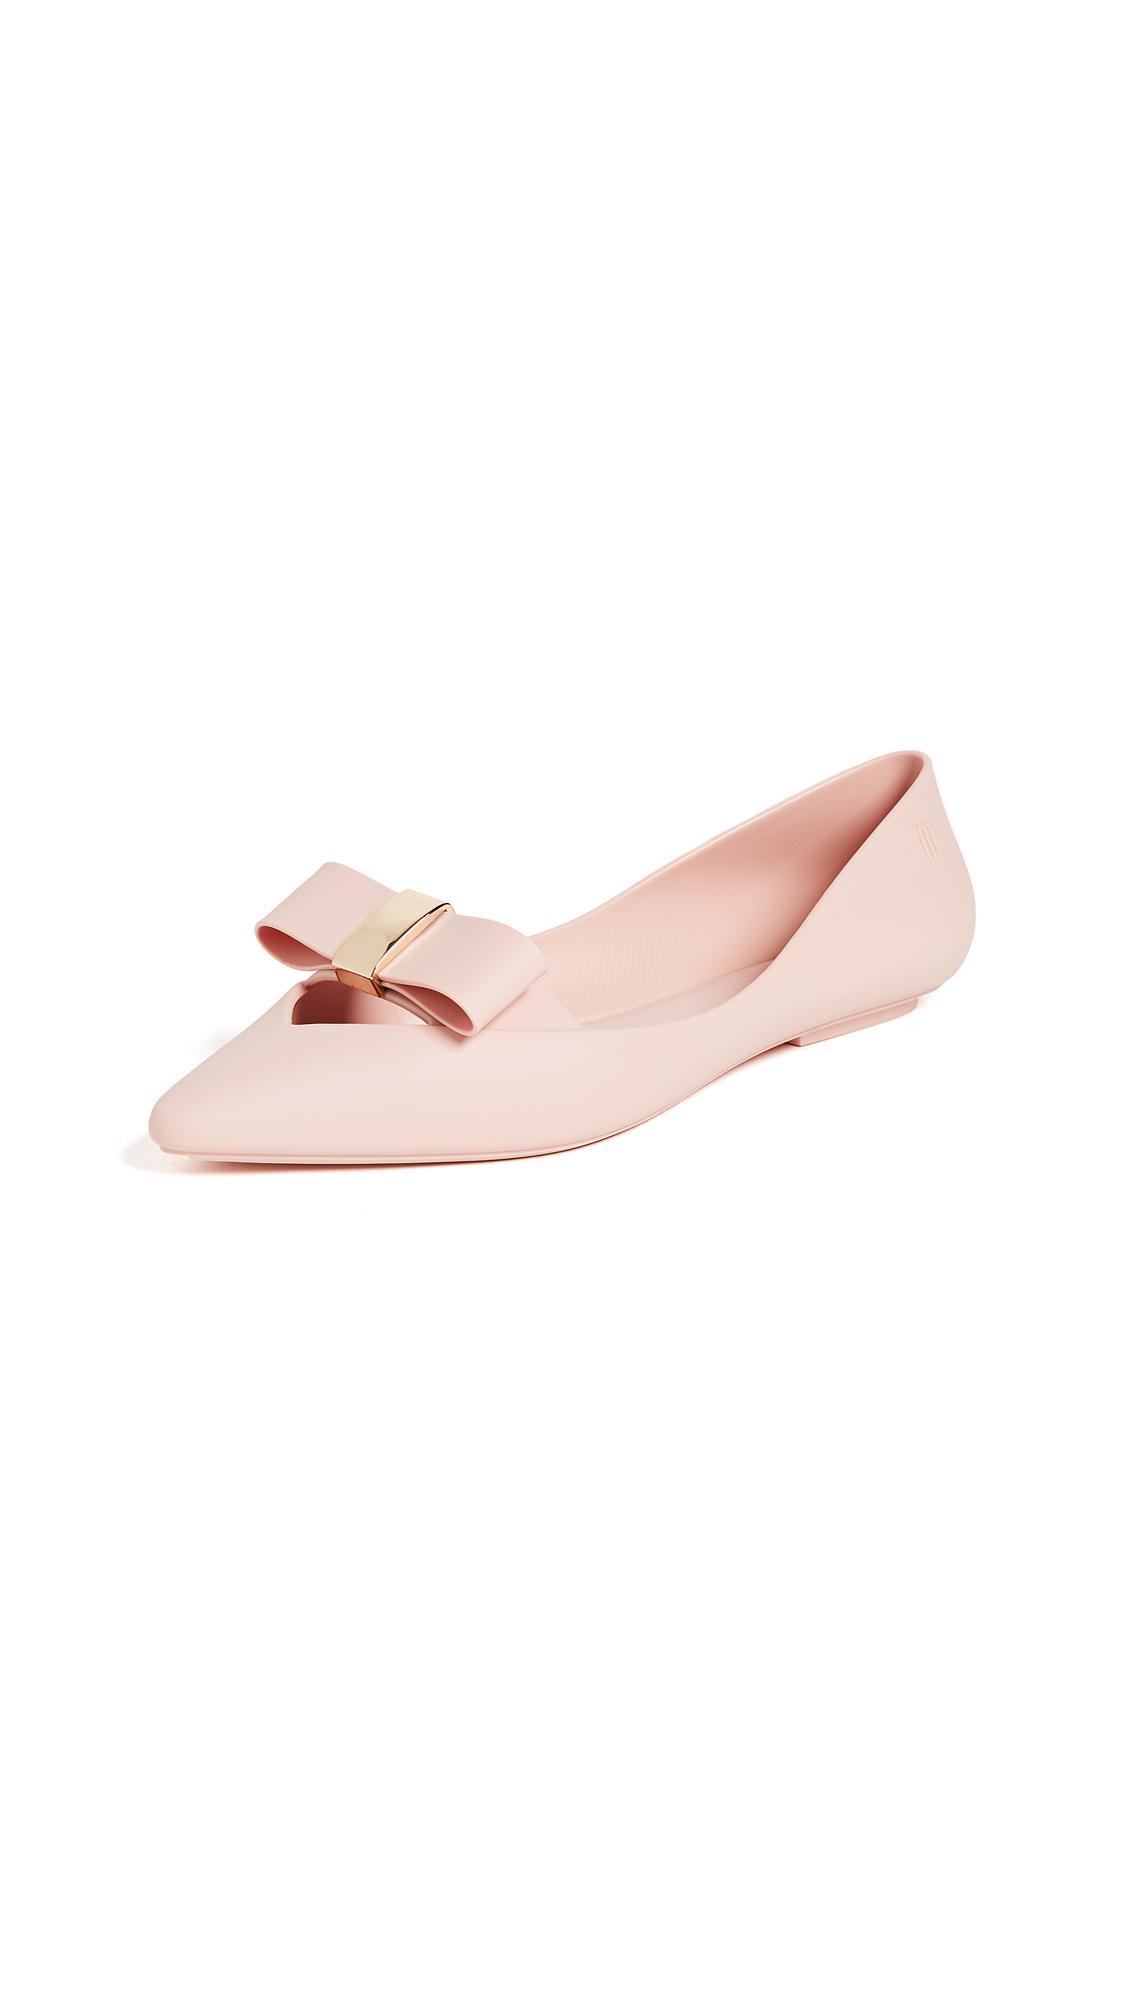 Melissa Maisie II Flats - Pink